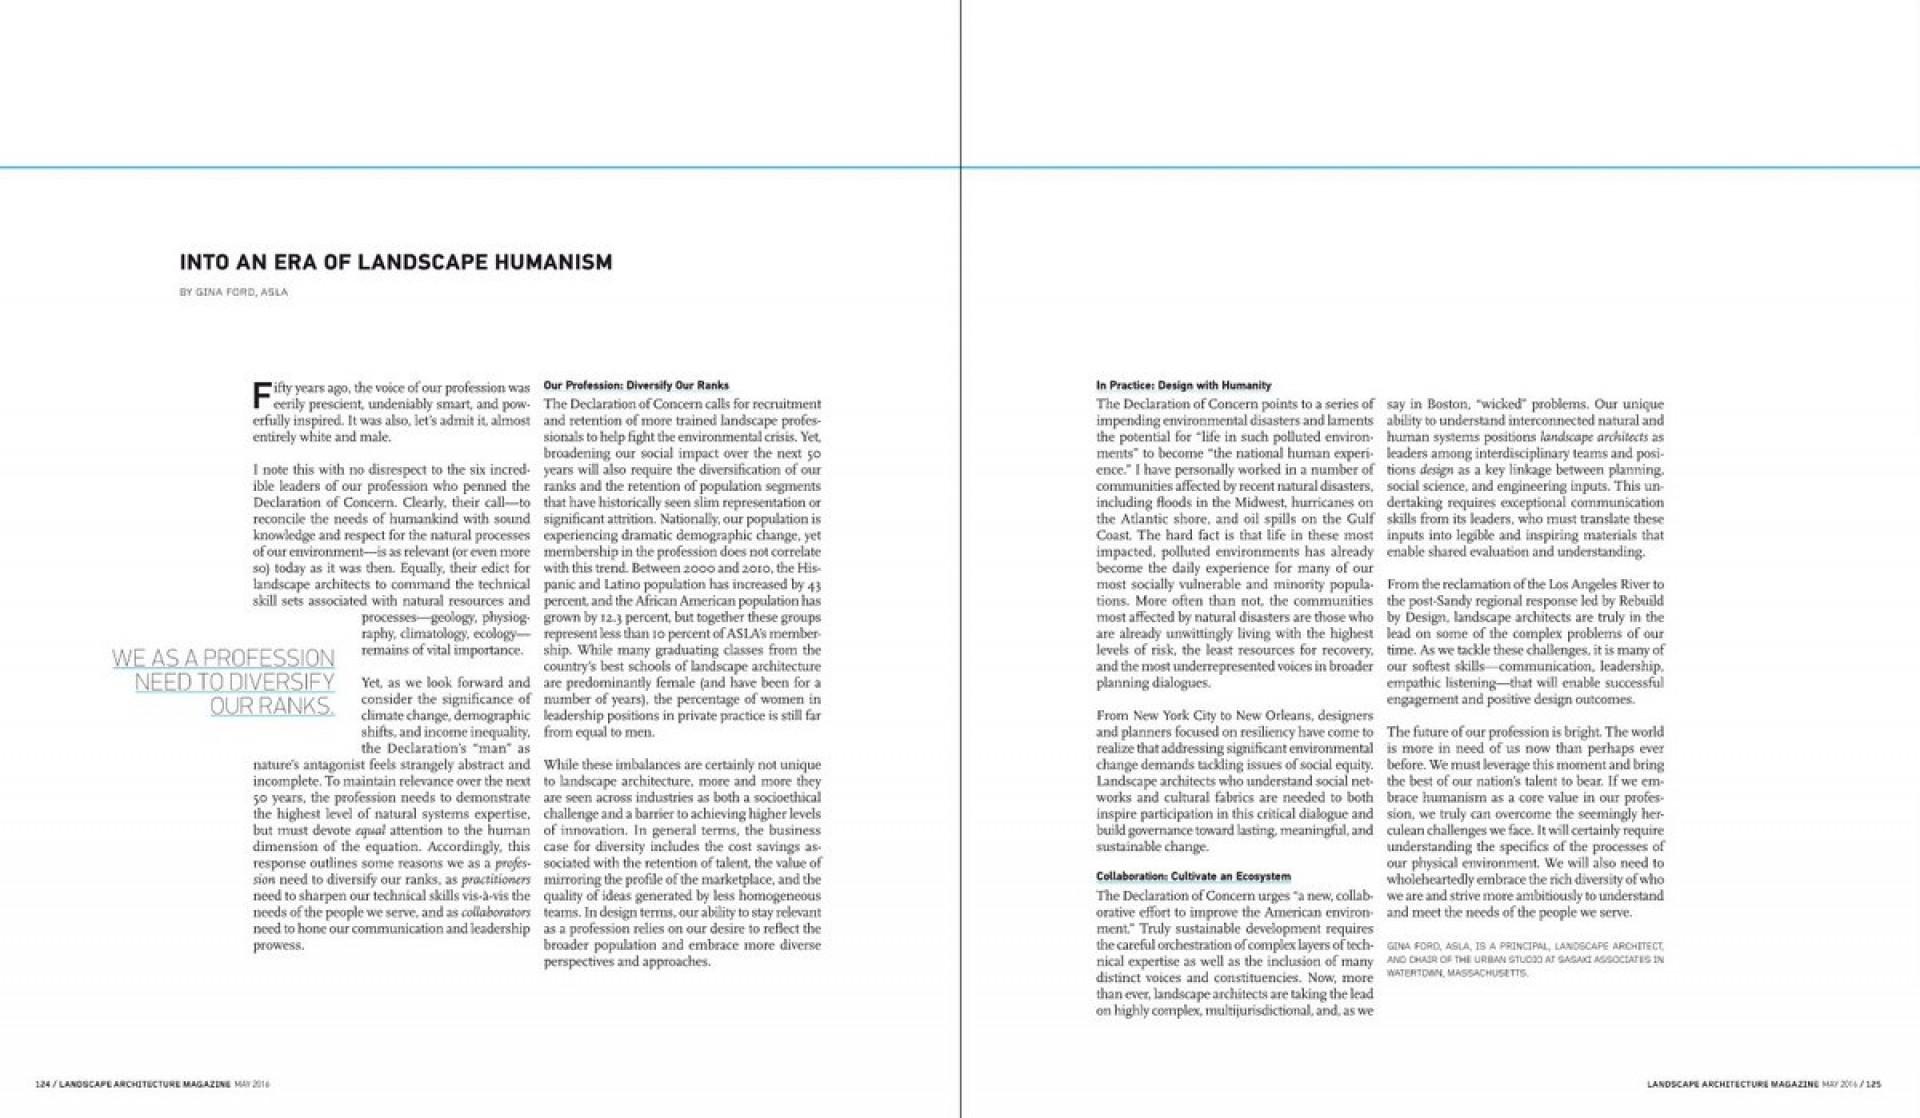 010 Landscape Architecture Essay Chyva1quuaafs6v Stunning Argumentative Topics 1920